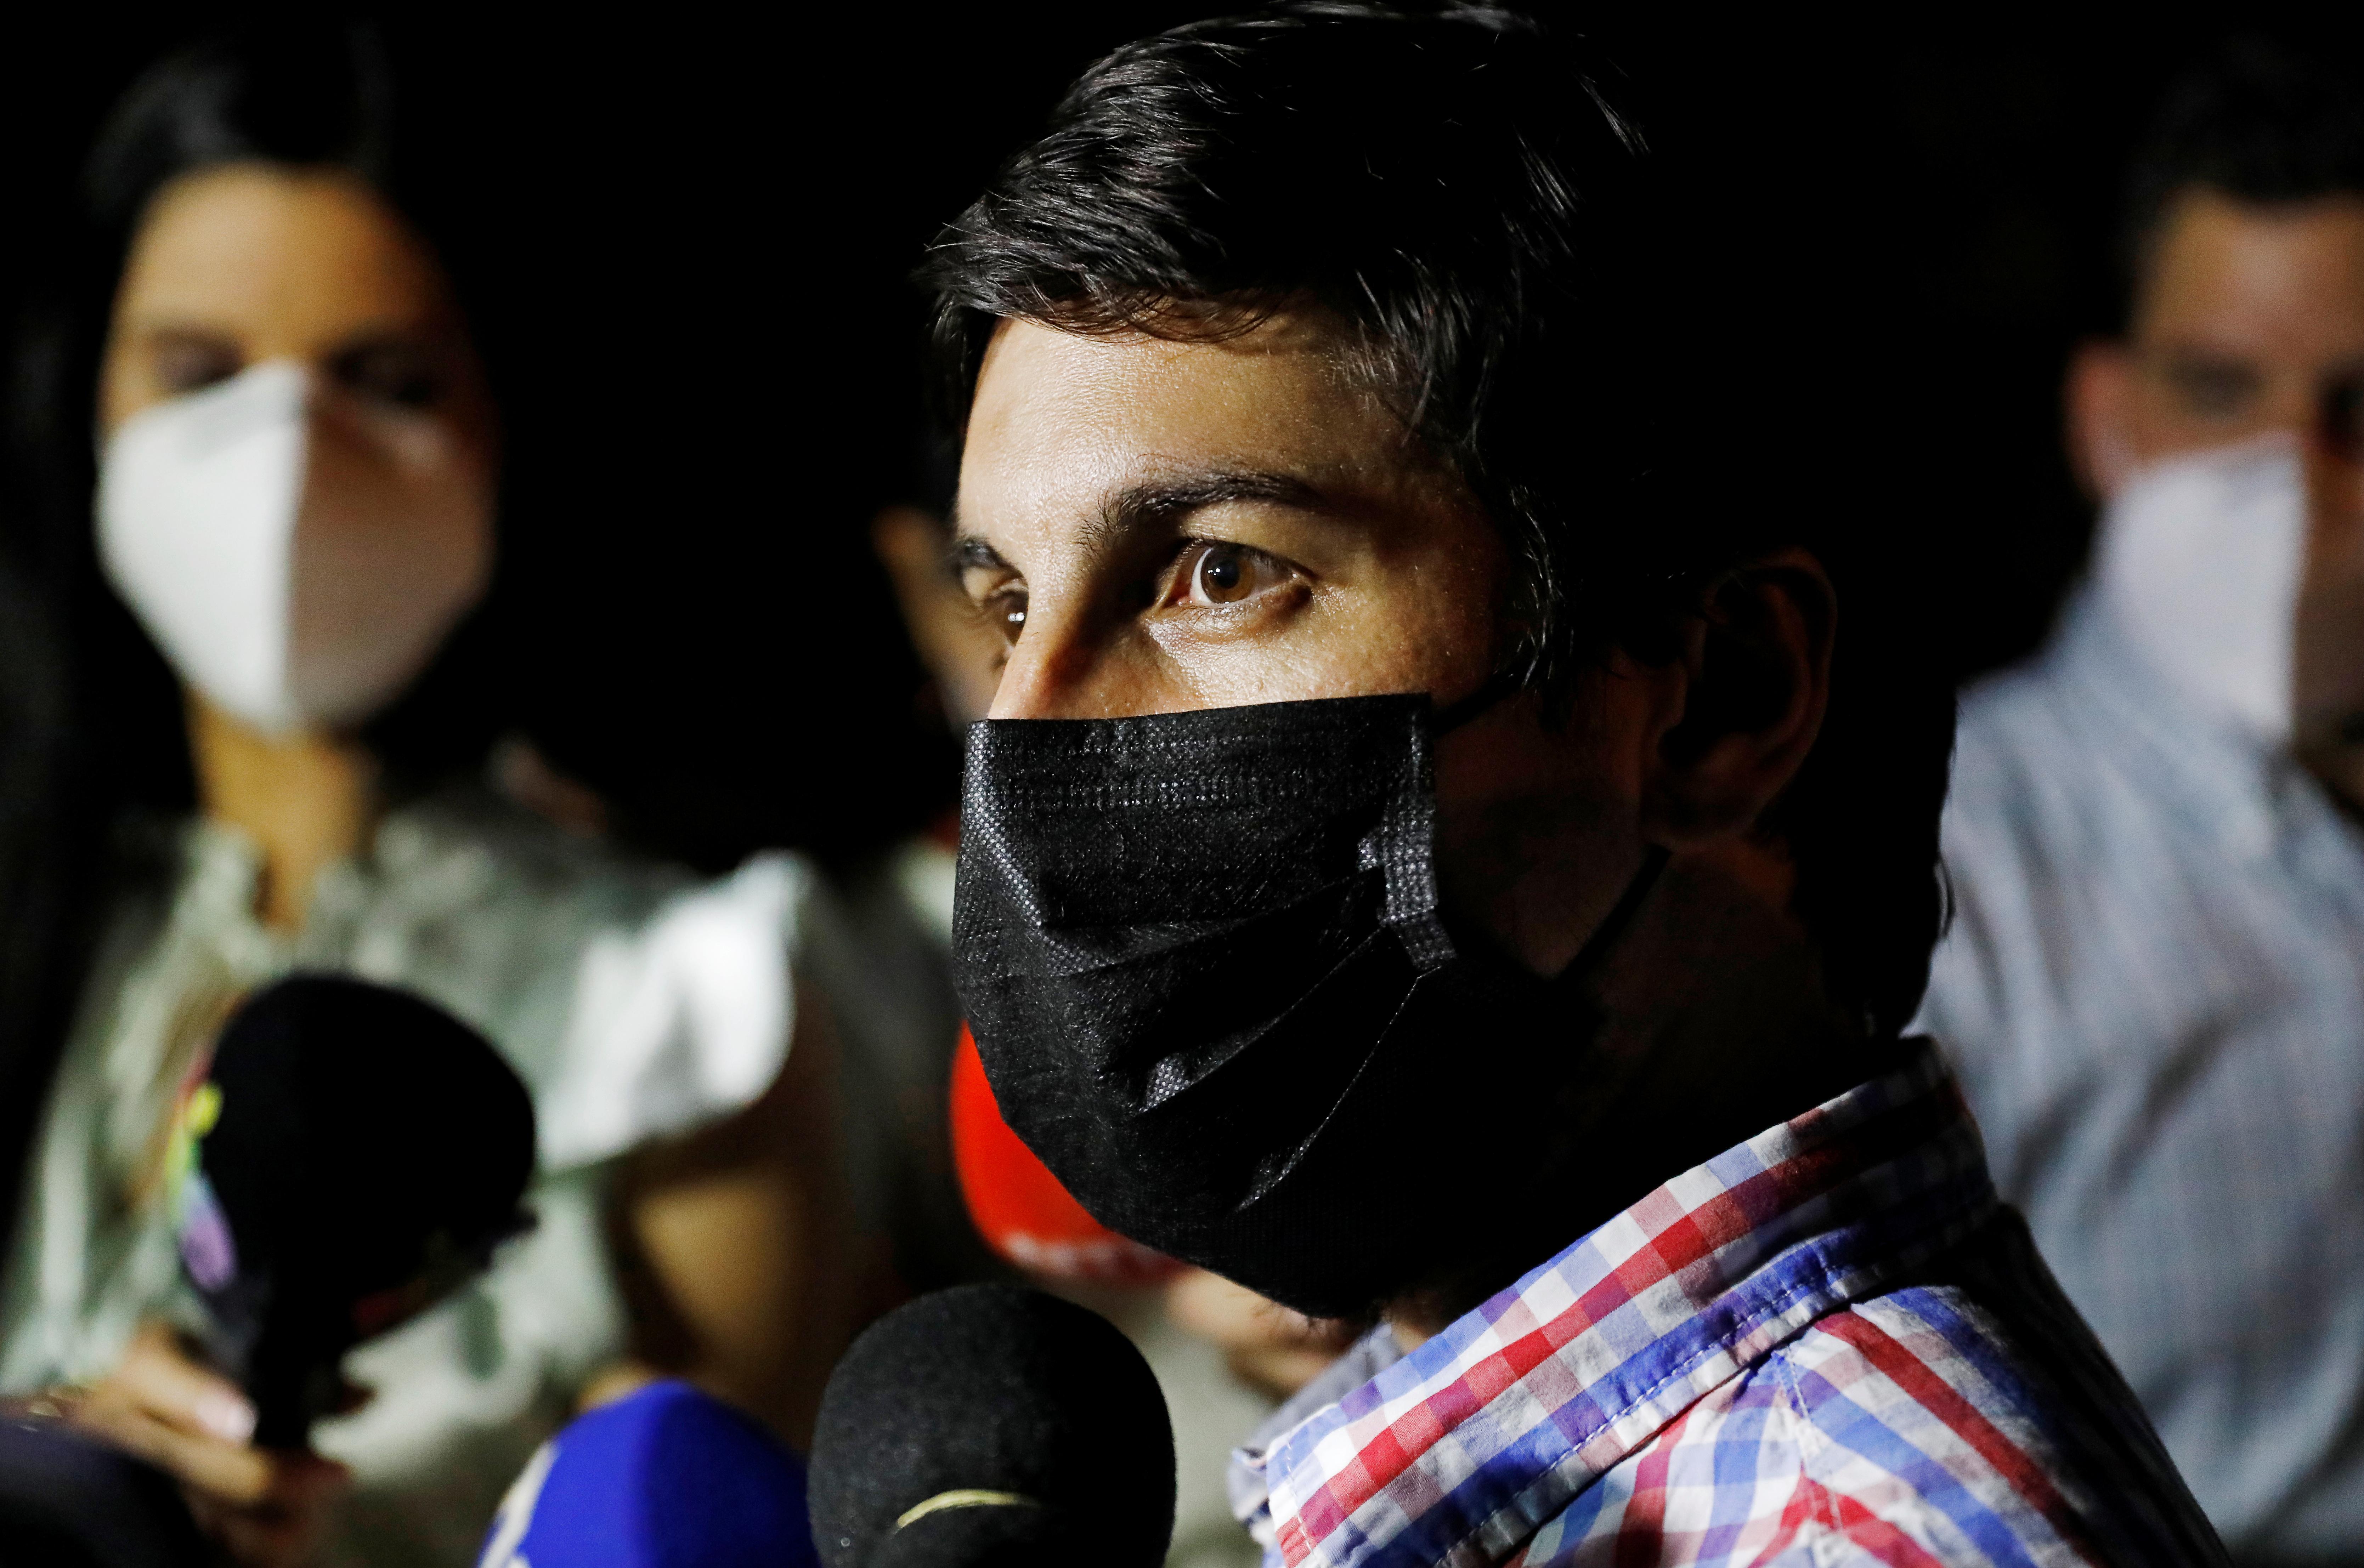 Venezuelan opposition leader Freddy Guevara speaks to the media after leaving